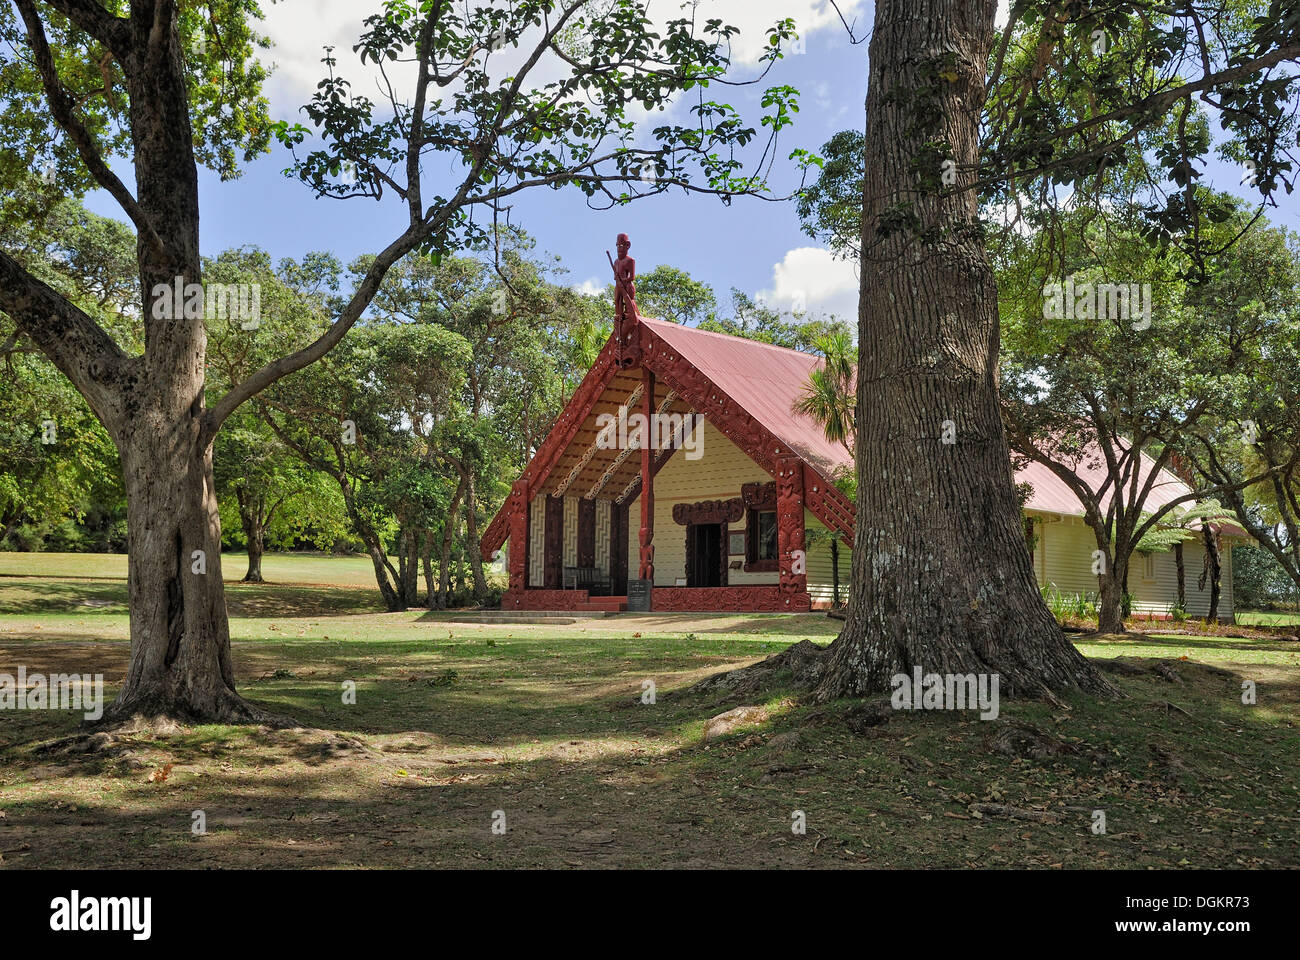 Maori Meeting House, Waitangi Treaty Grounds, Waitangi, North Island, New Zealand - Stock Image